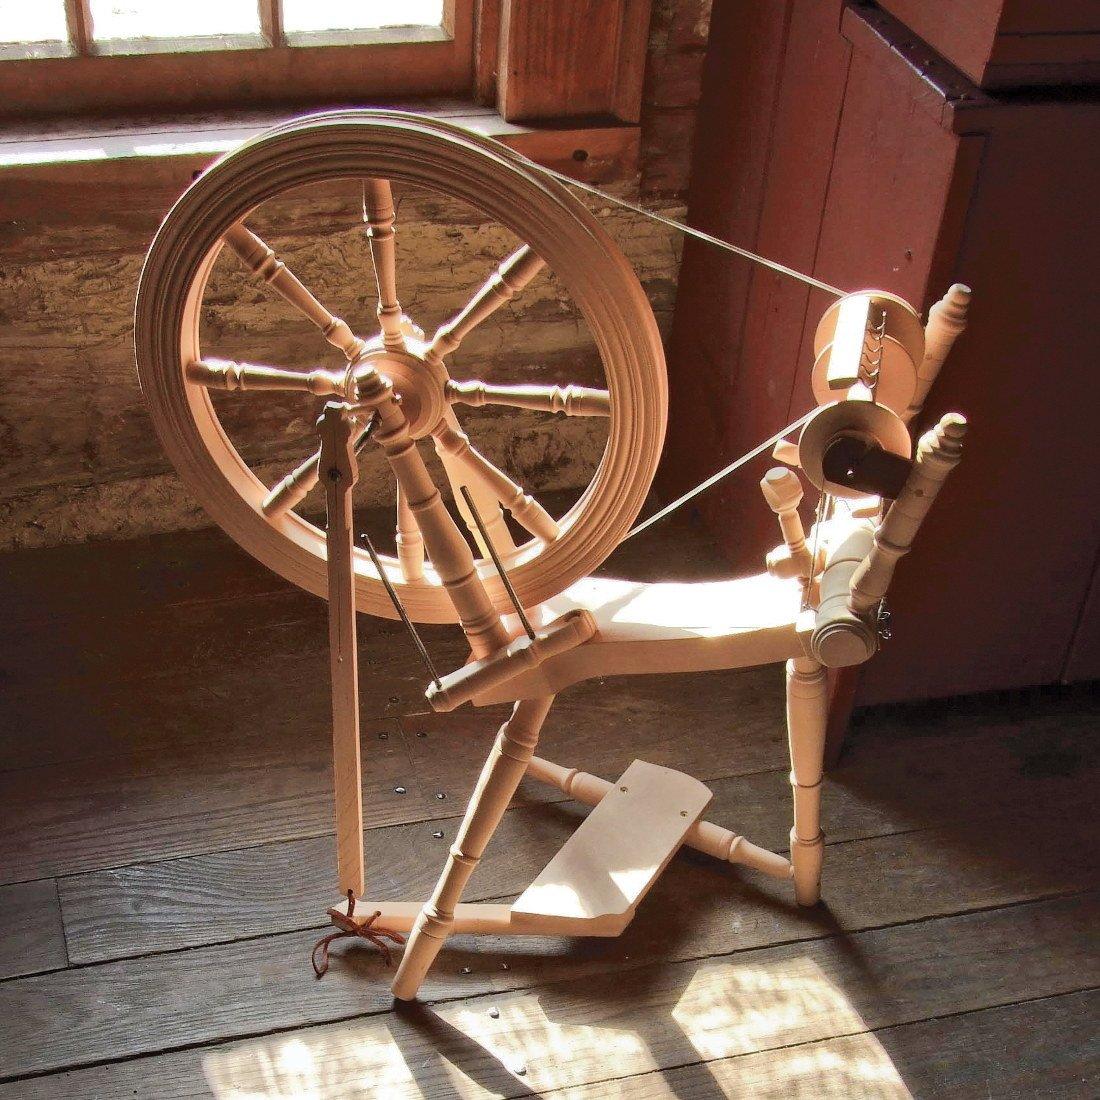 Revolving Wheel